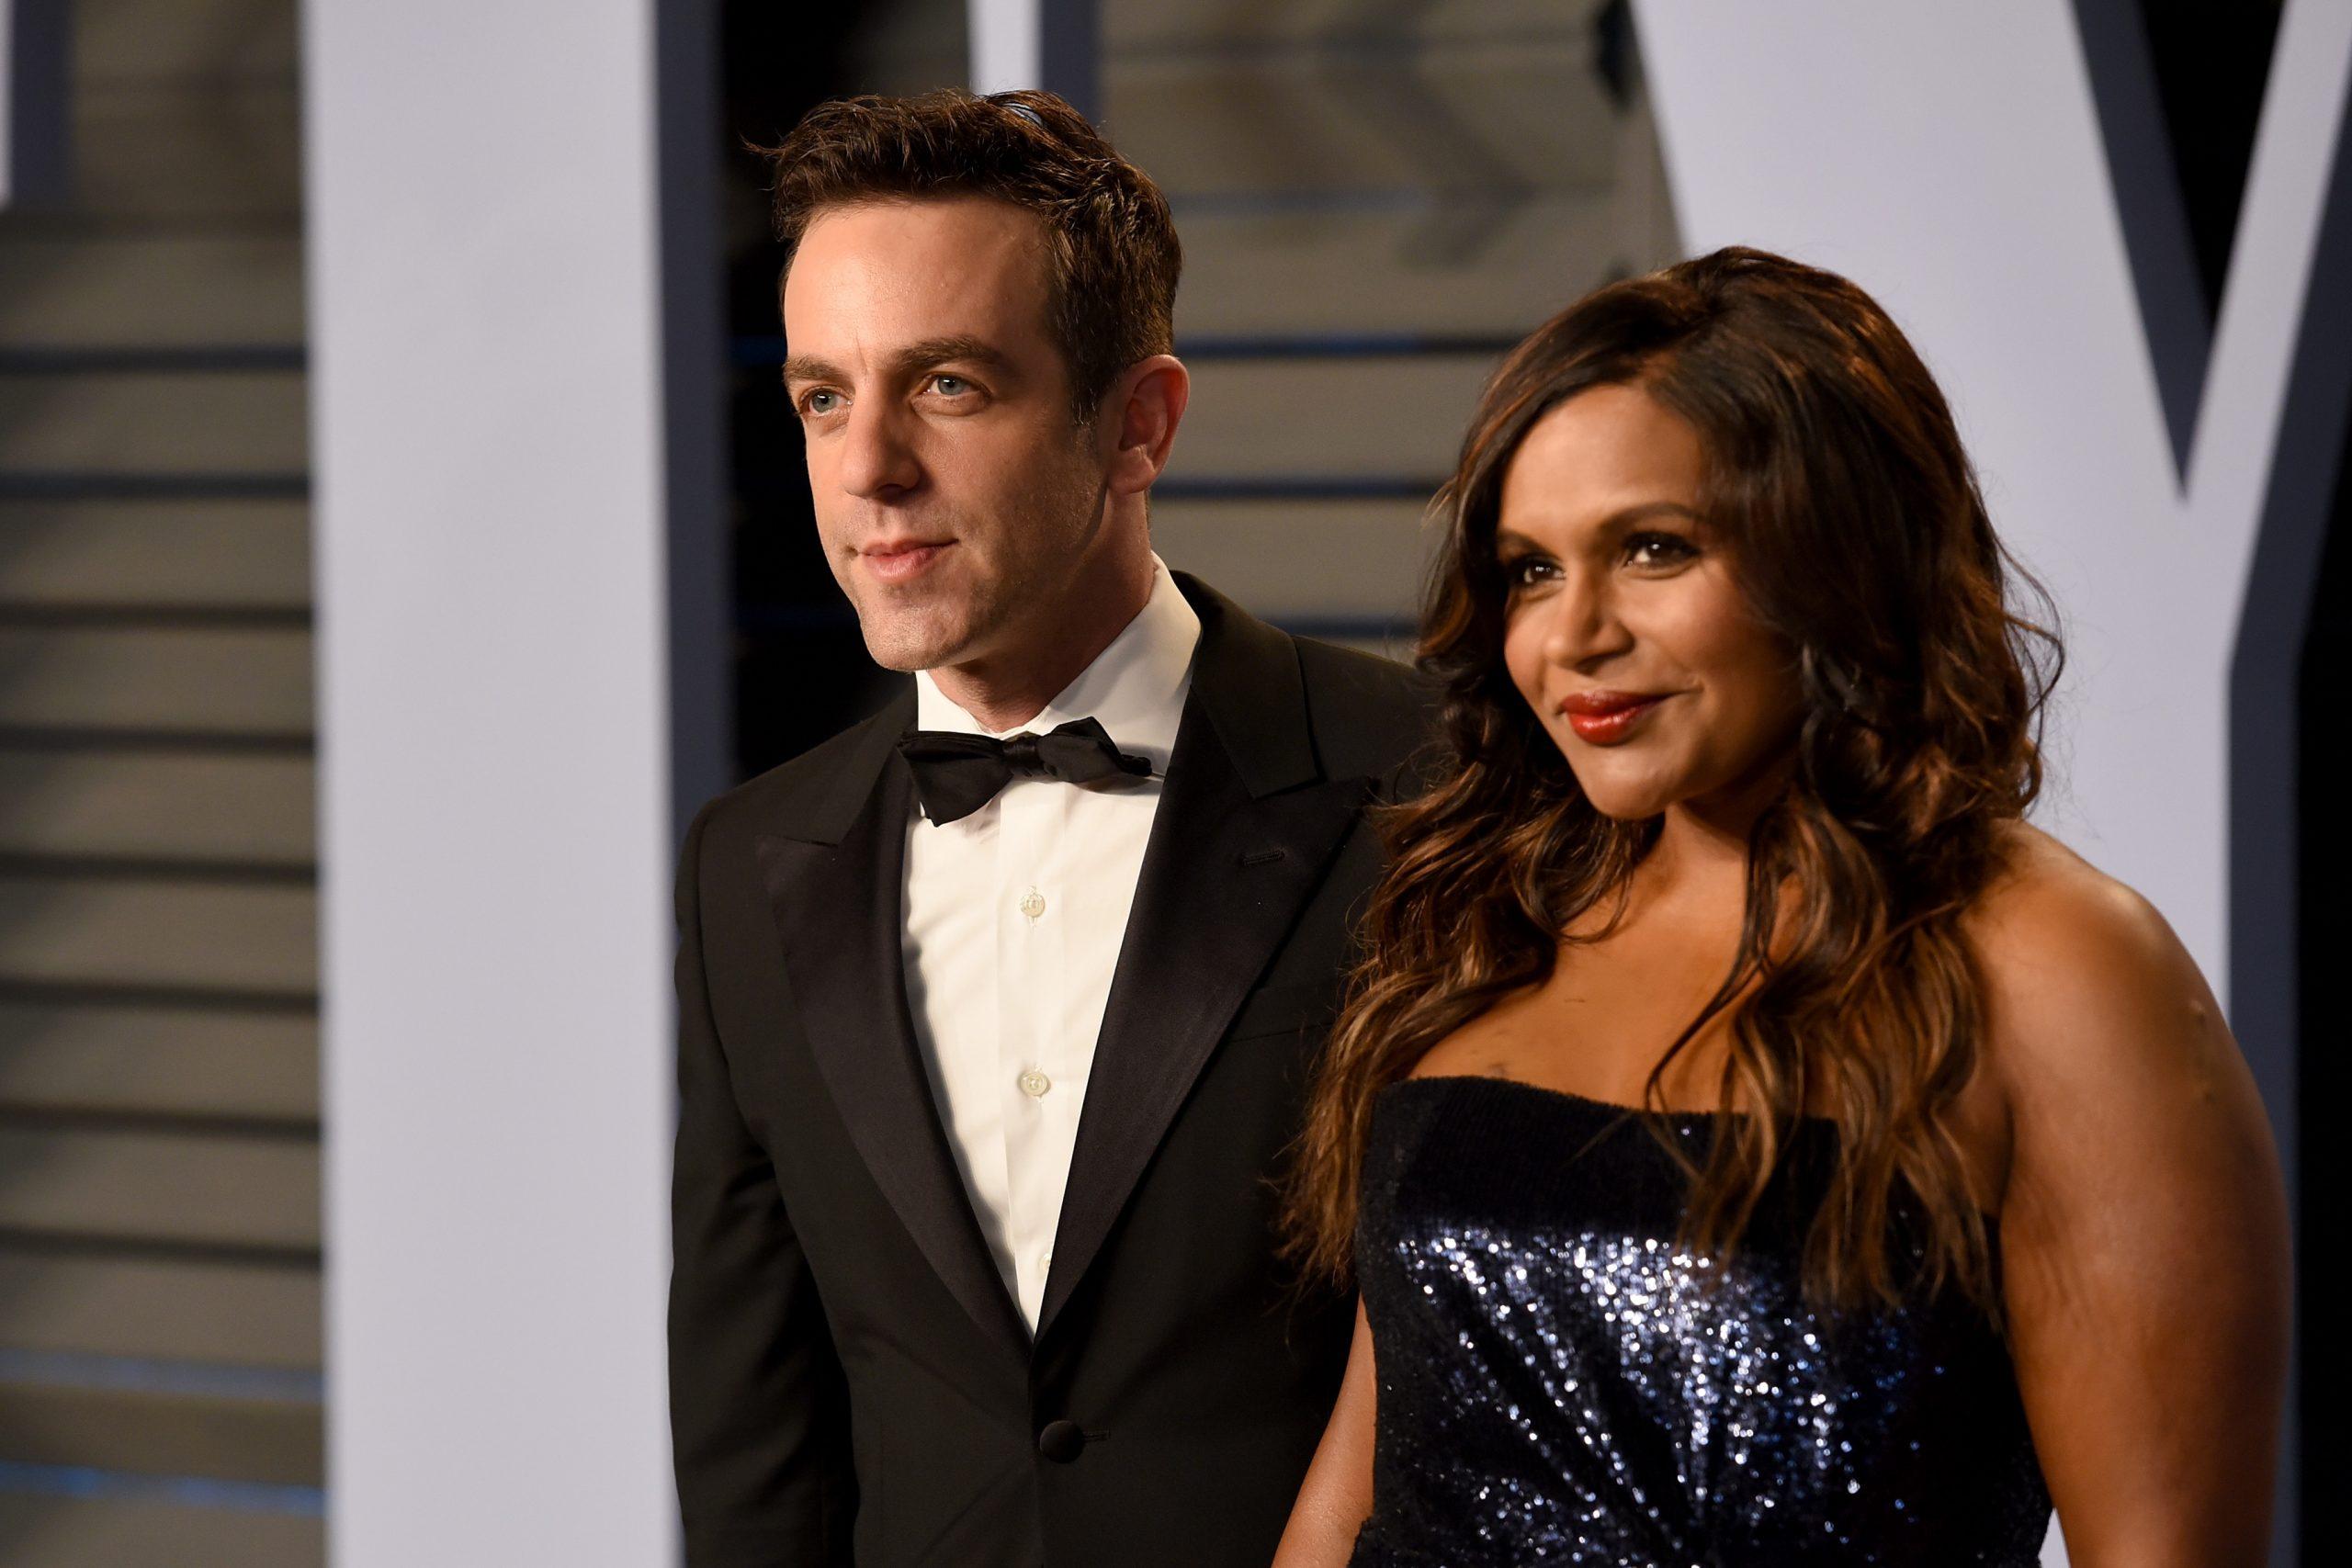 BJ Novak and Mindy Kaling at the 2018 Vanity Fair Oscar Party